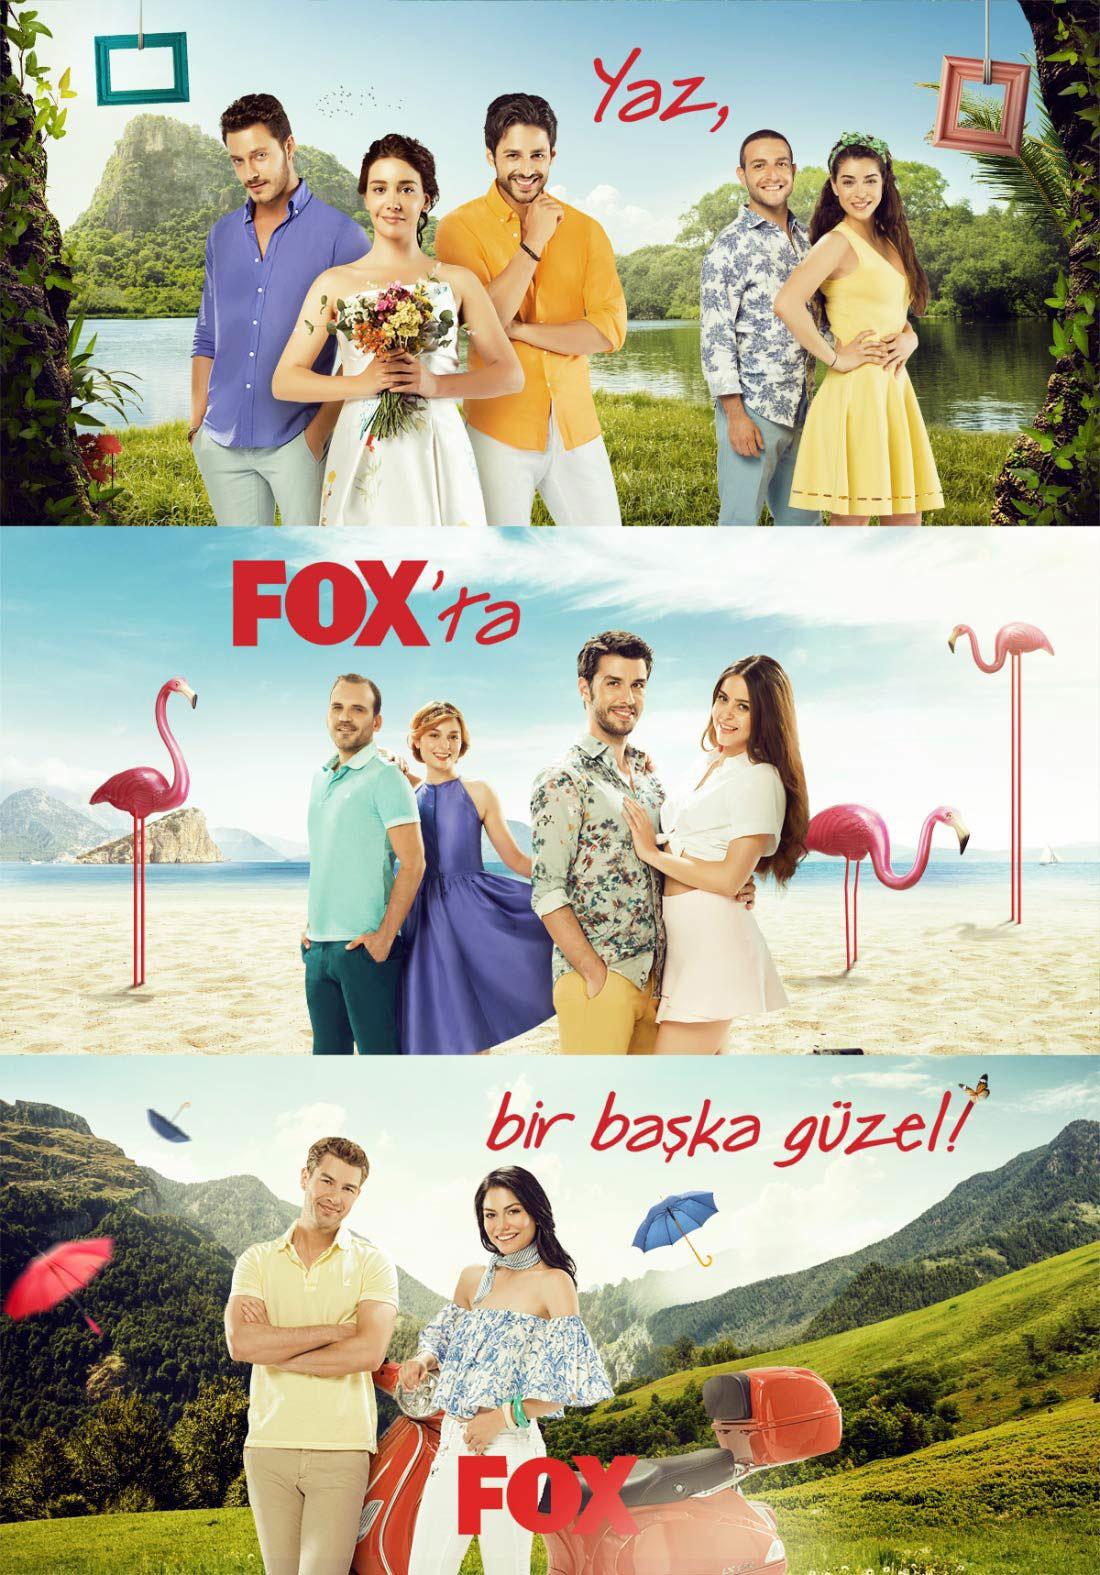 fox-summer-seasonal-campaign-01